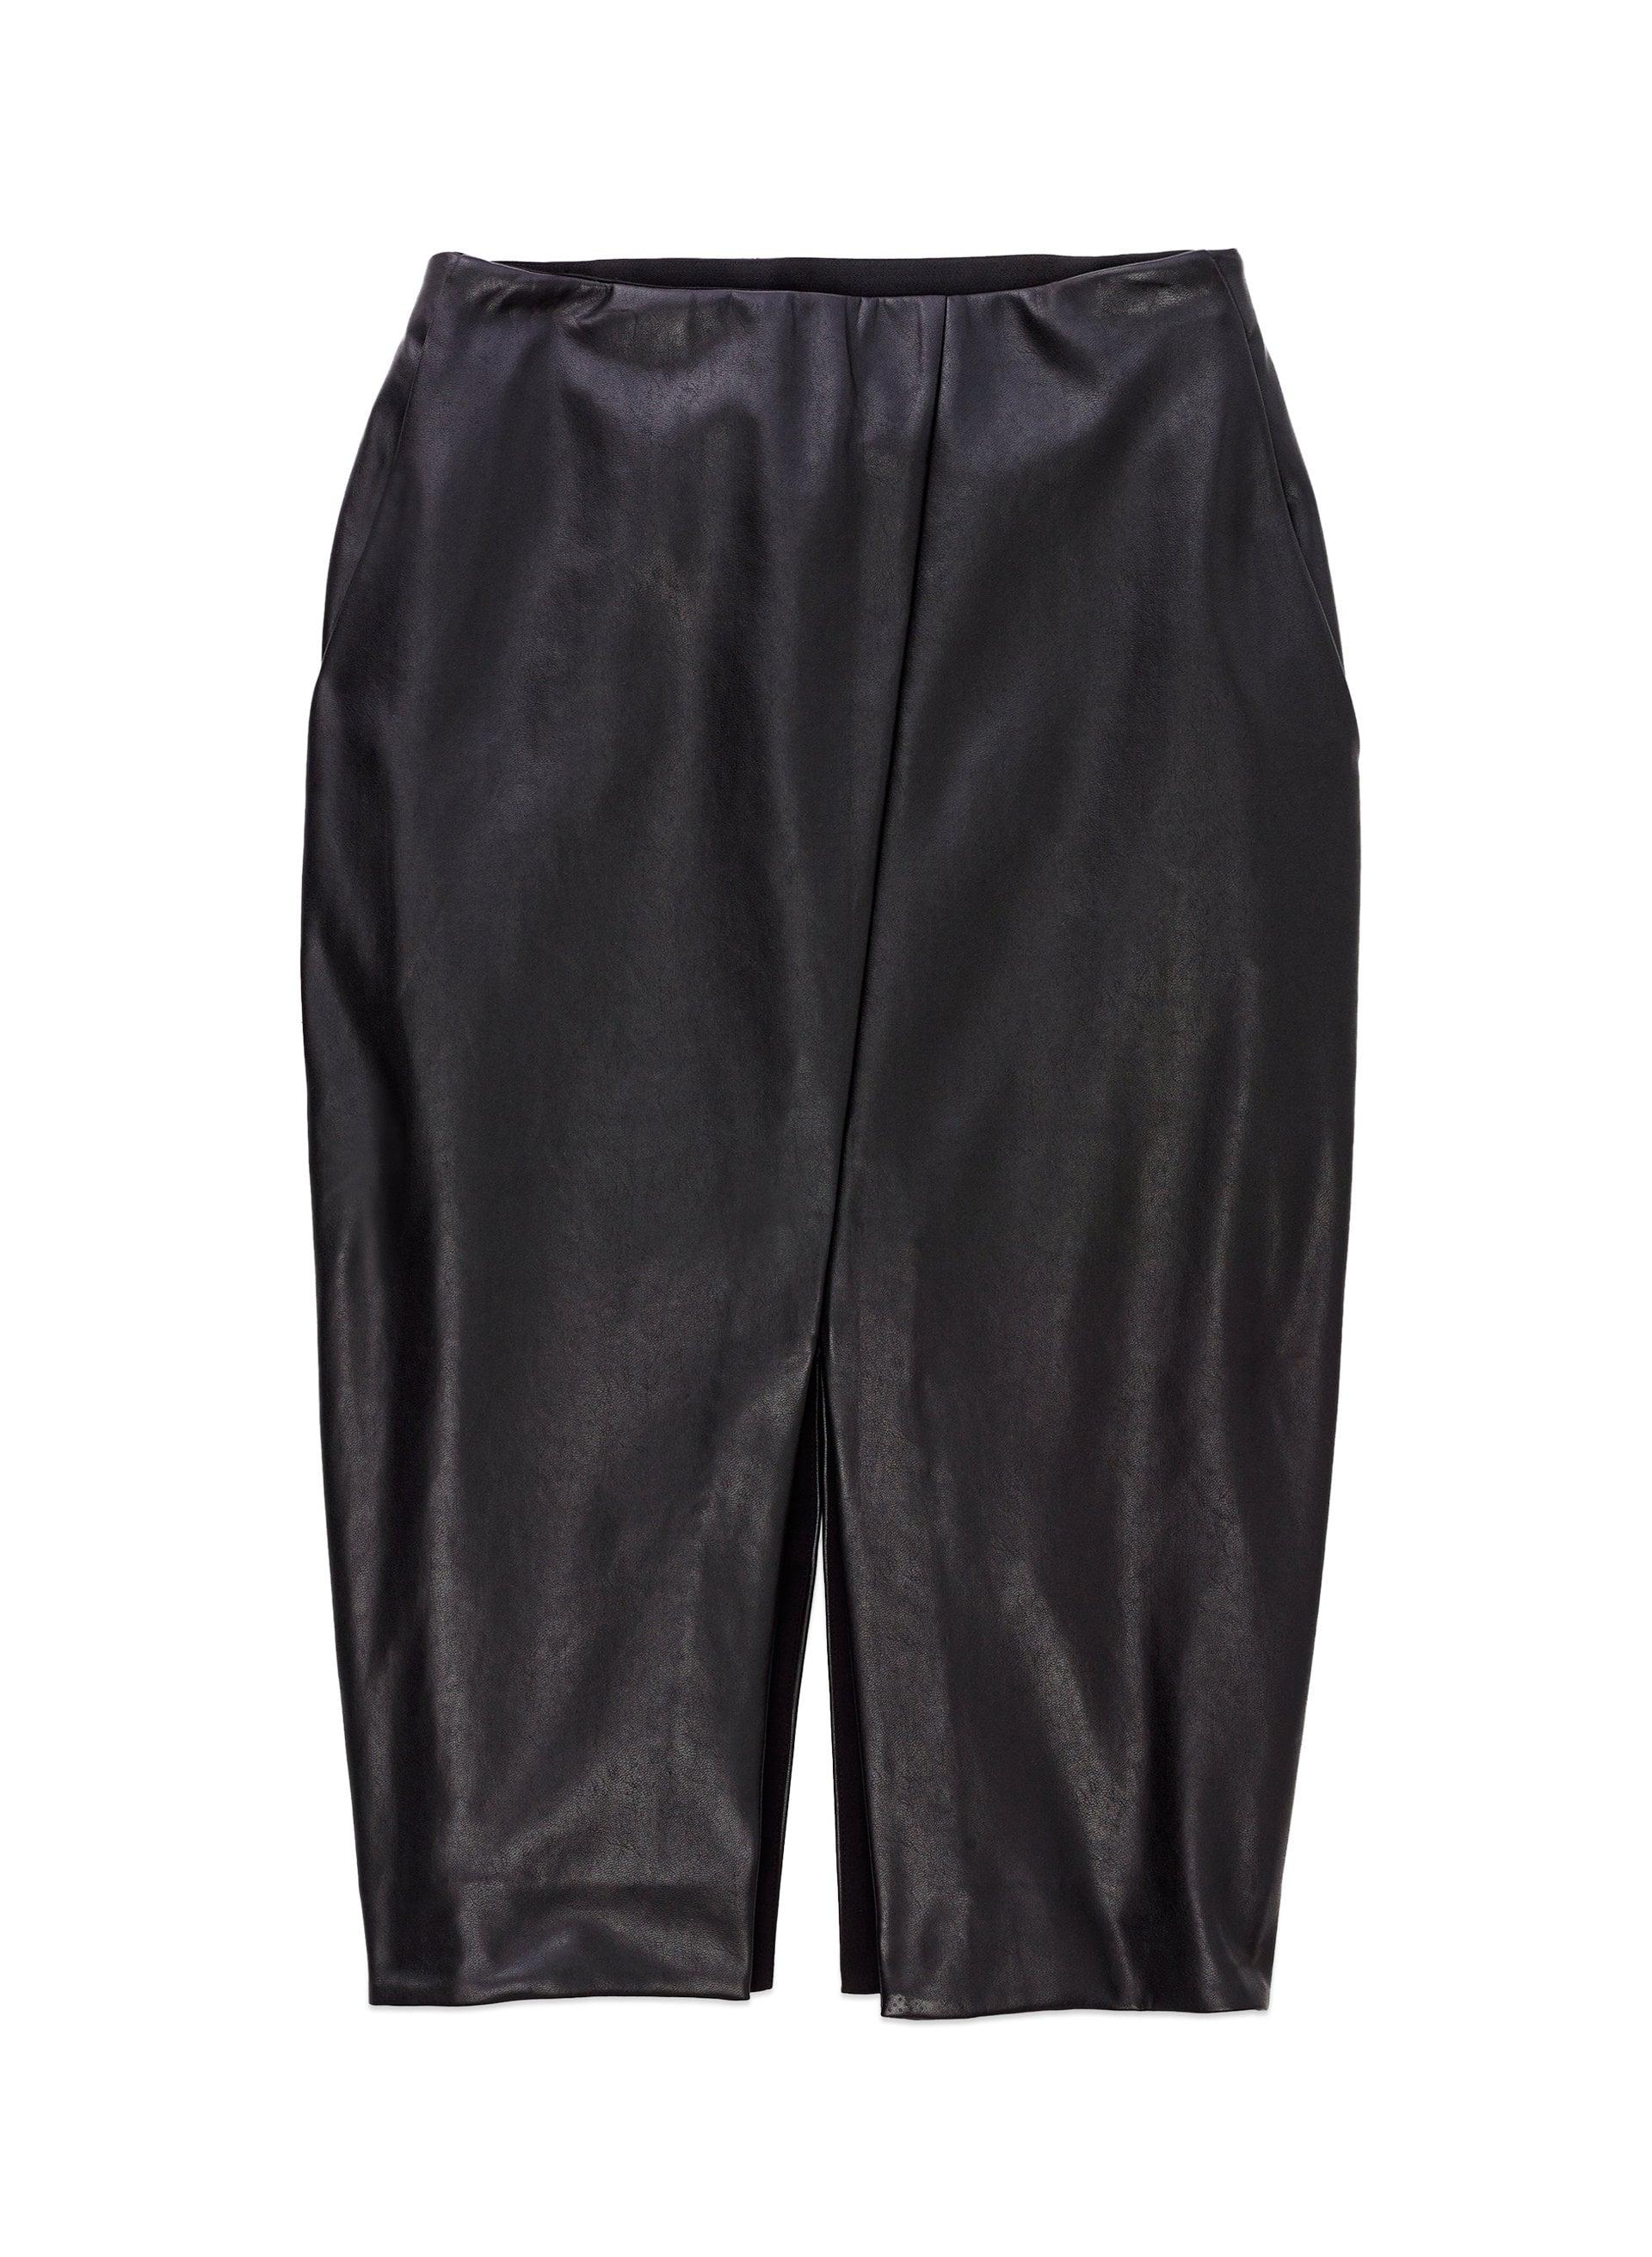 Aritzia Slit Leather Skirt